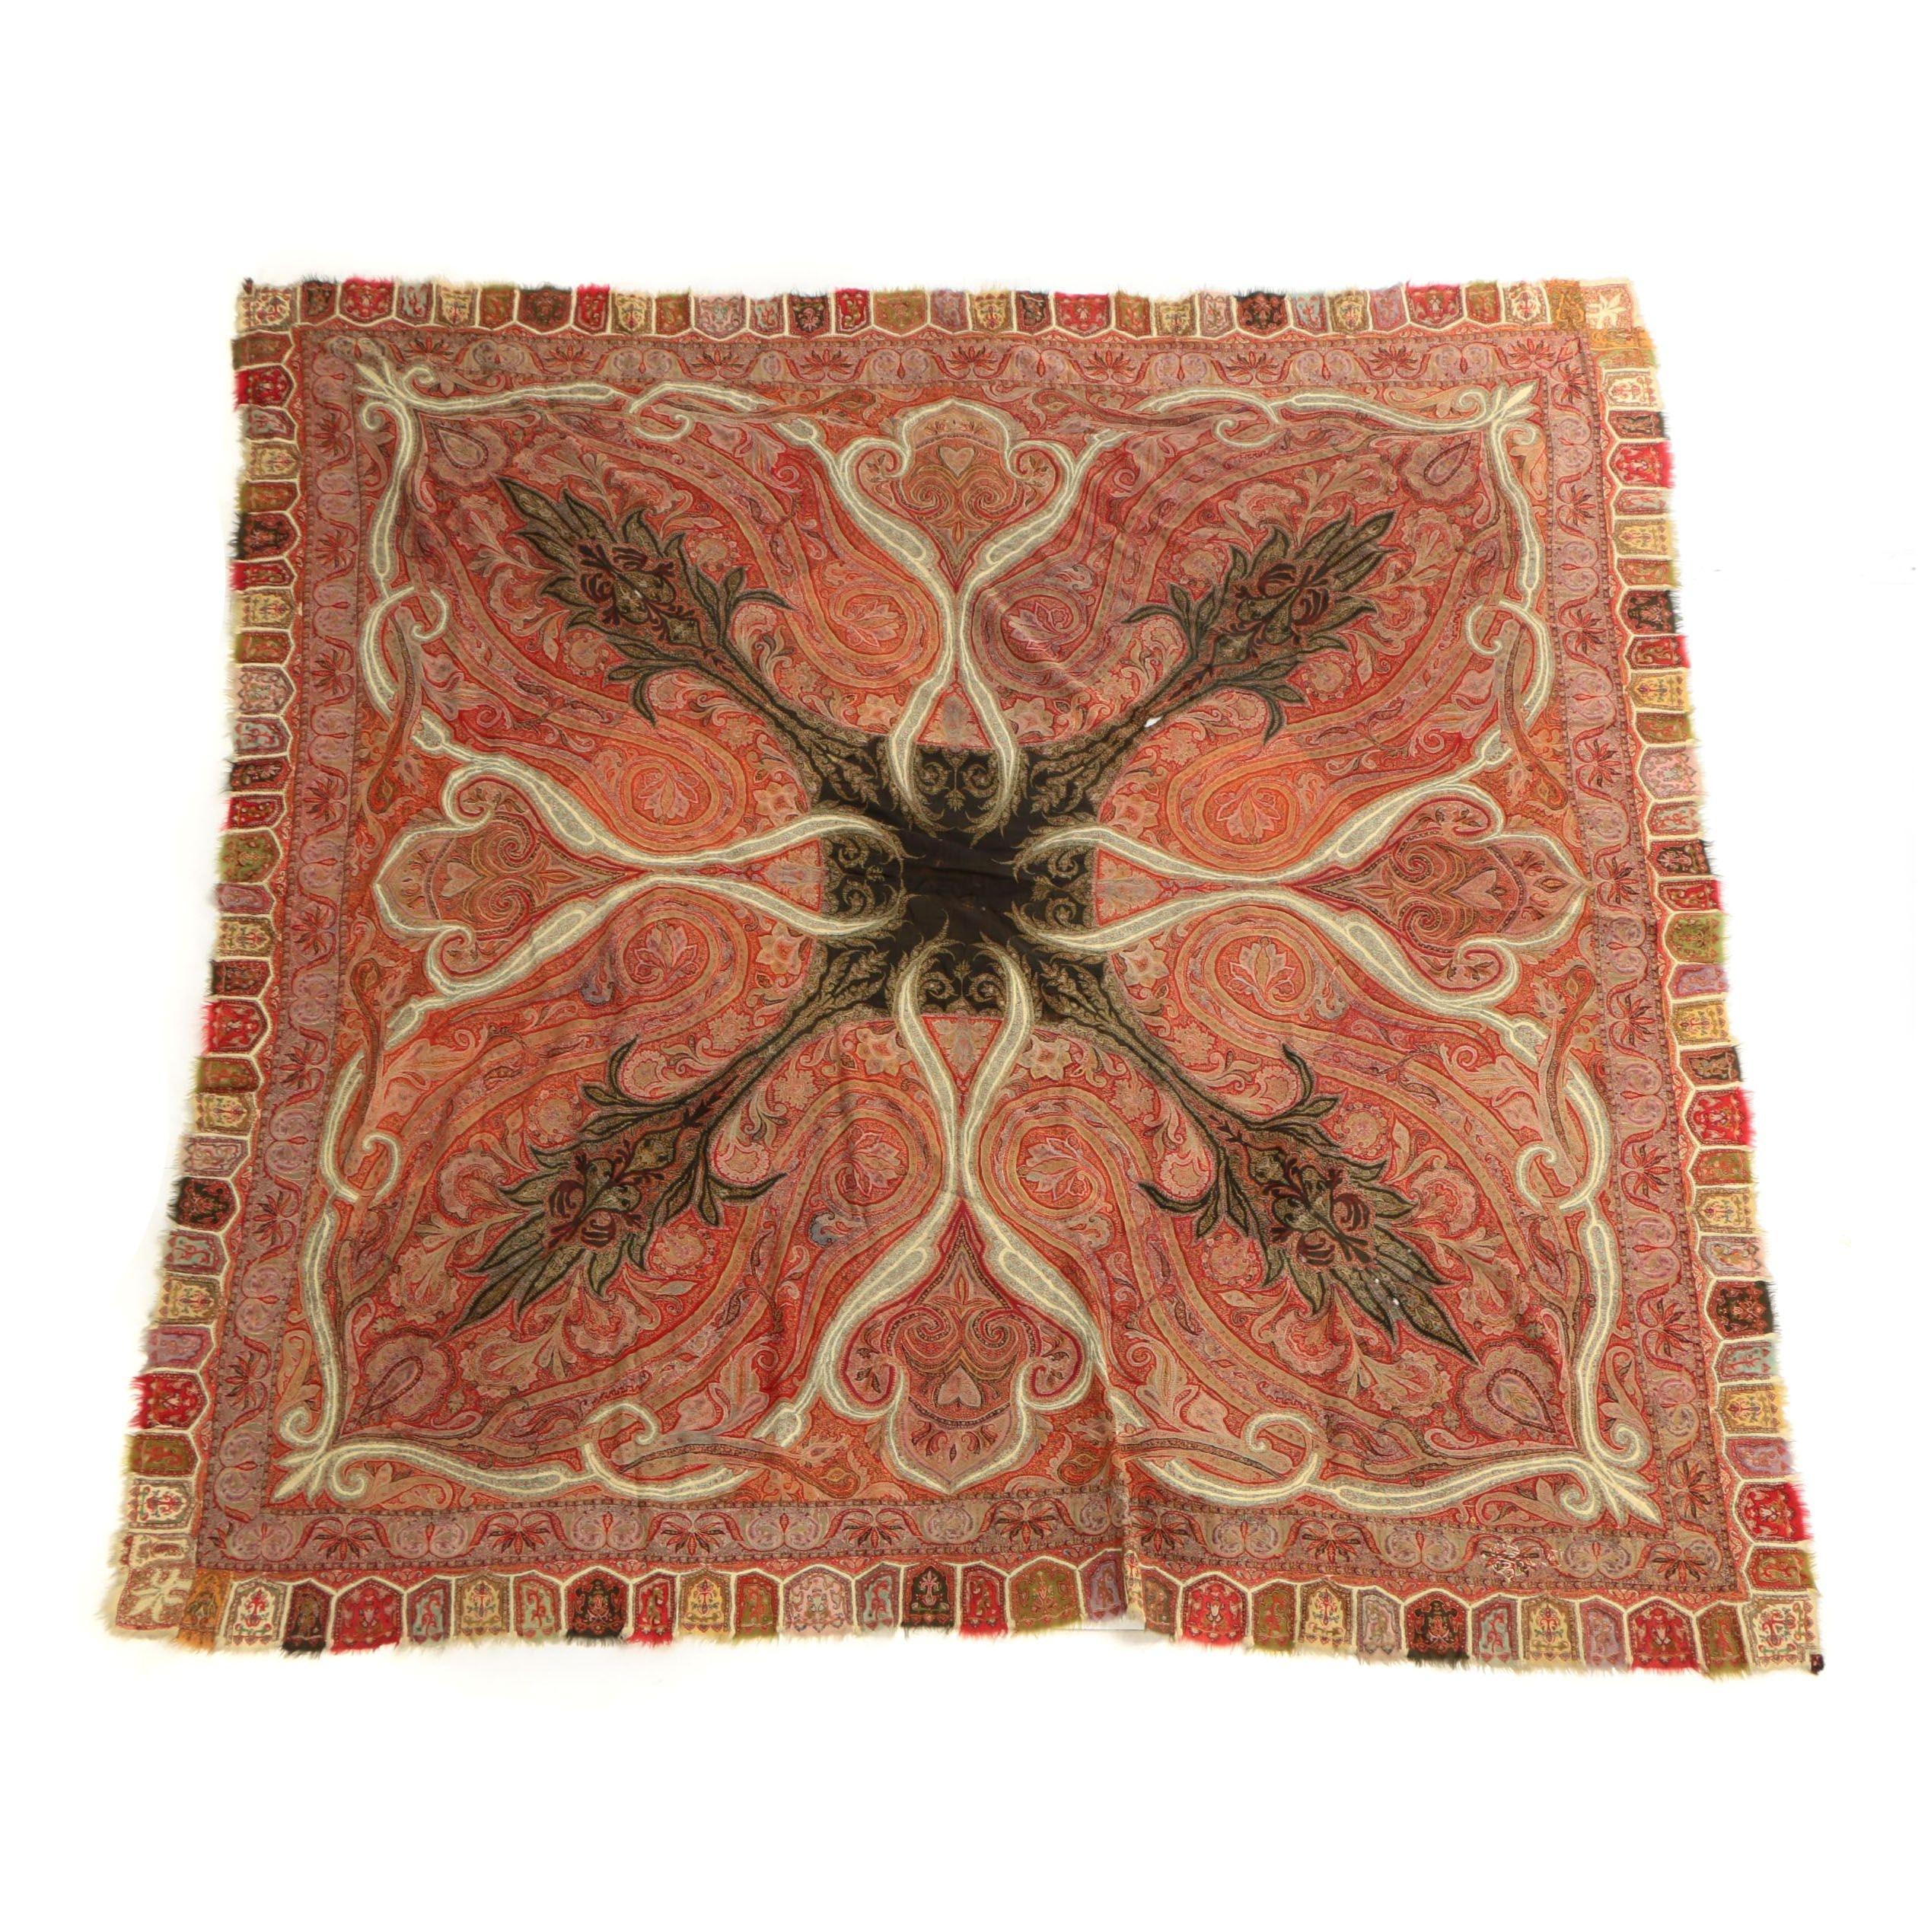 Indian Kashmiri Paisley Wool Shawl, Mid-19th Century